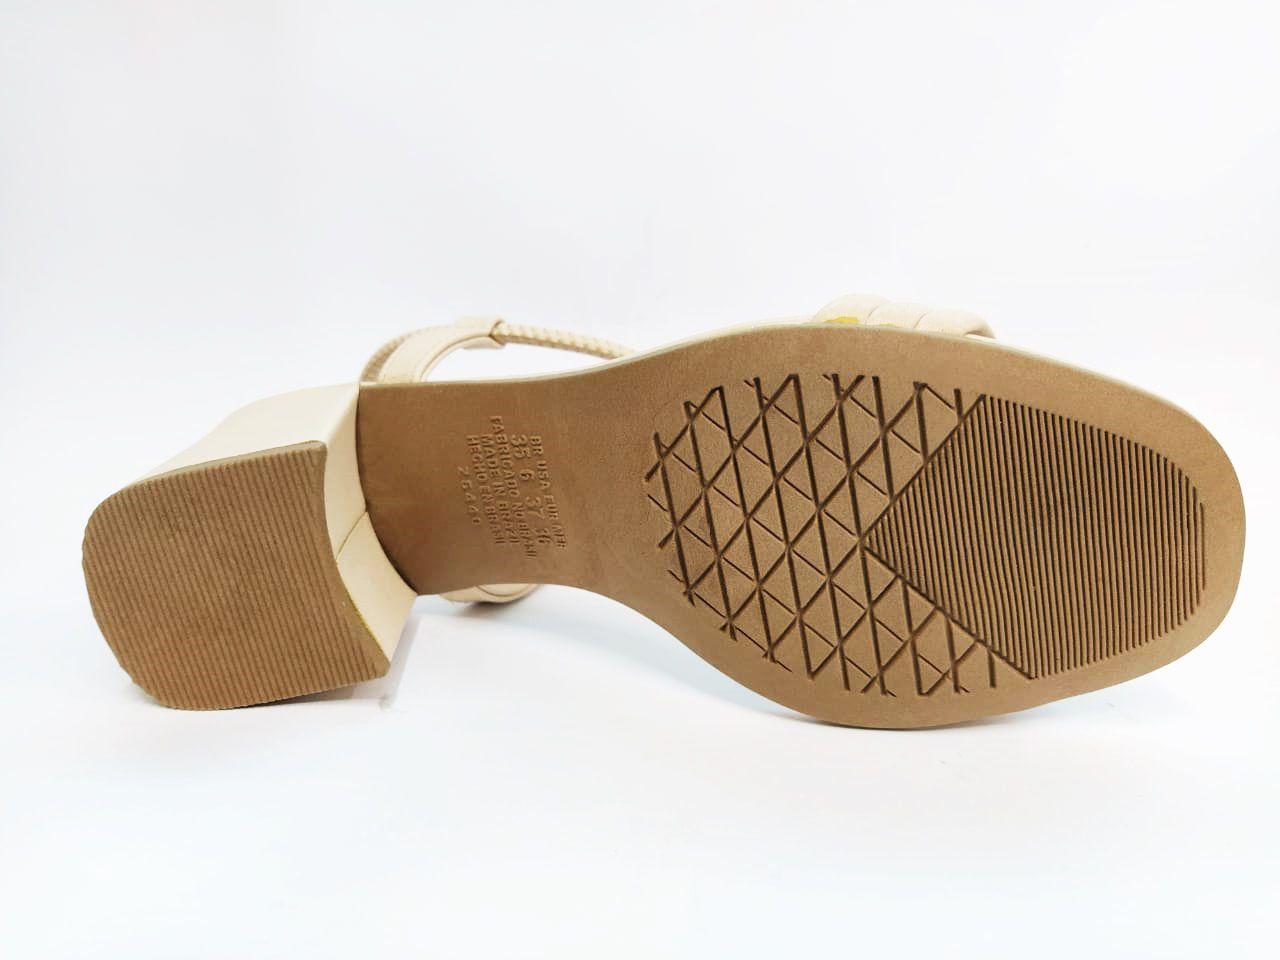 Sandalia Salto Grosso Dakota Z6411 - Branco/Mascavo